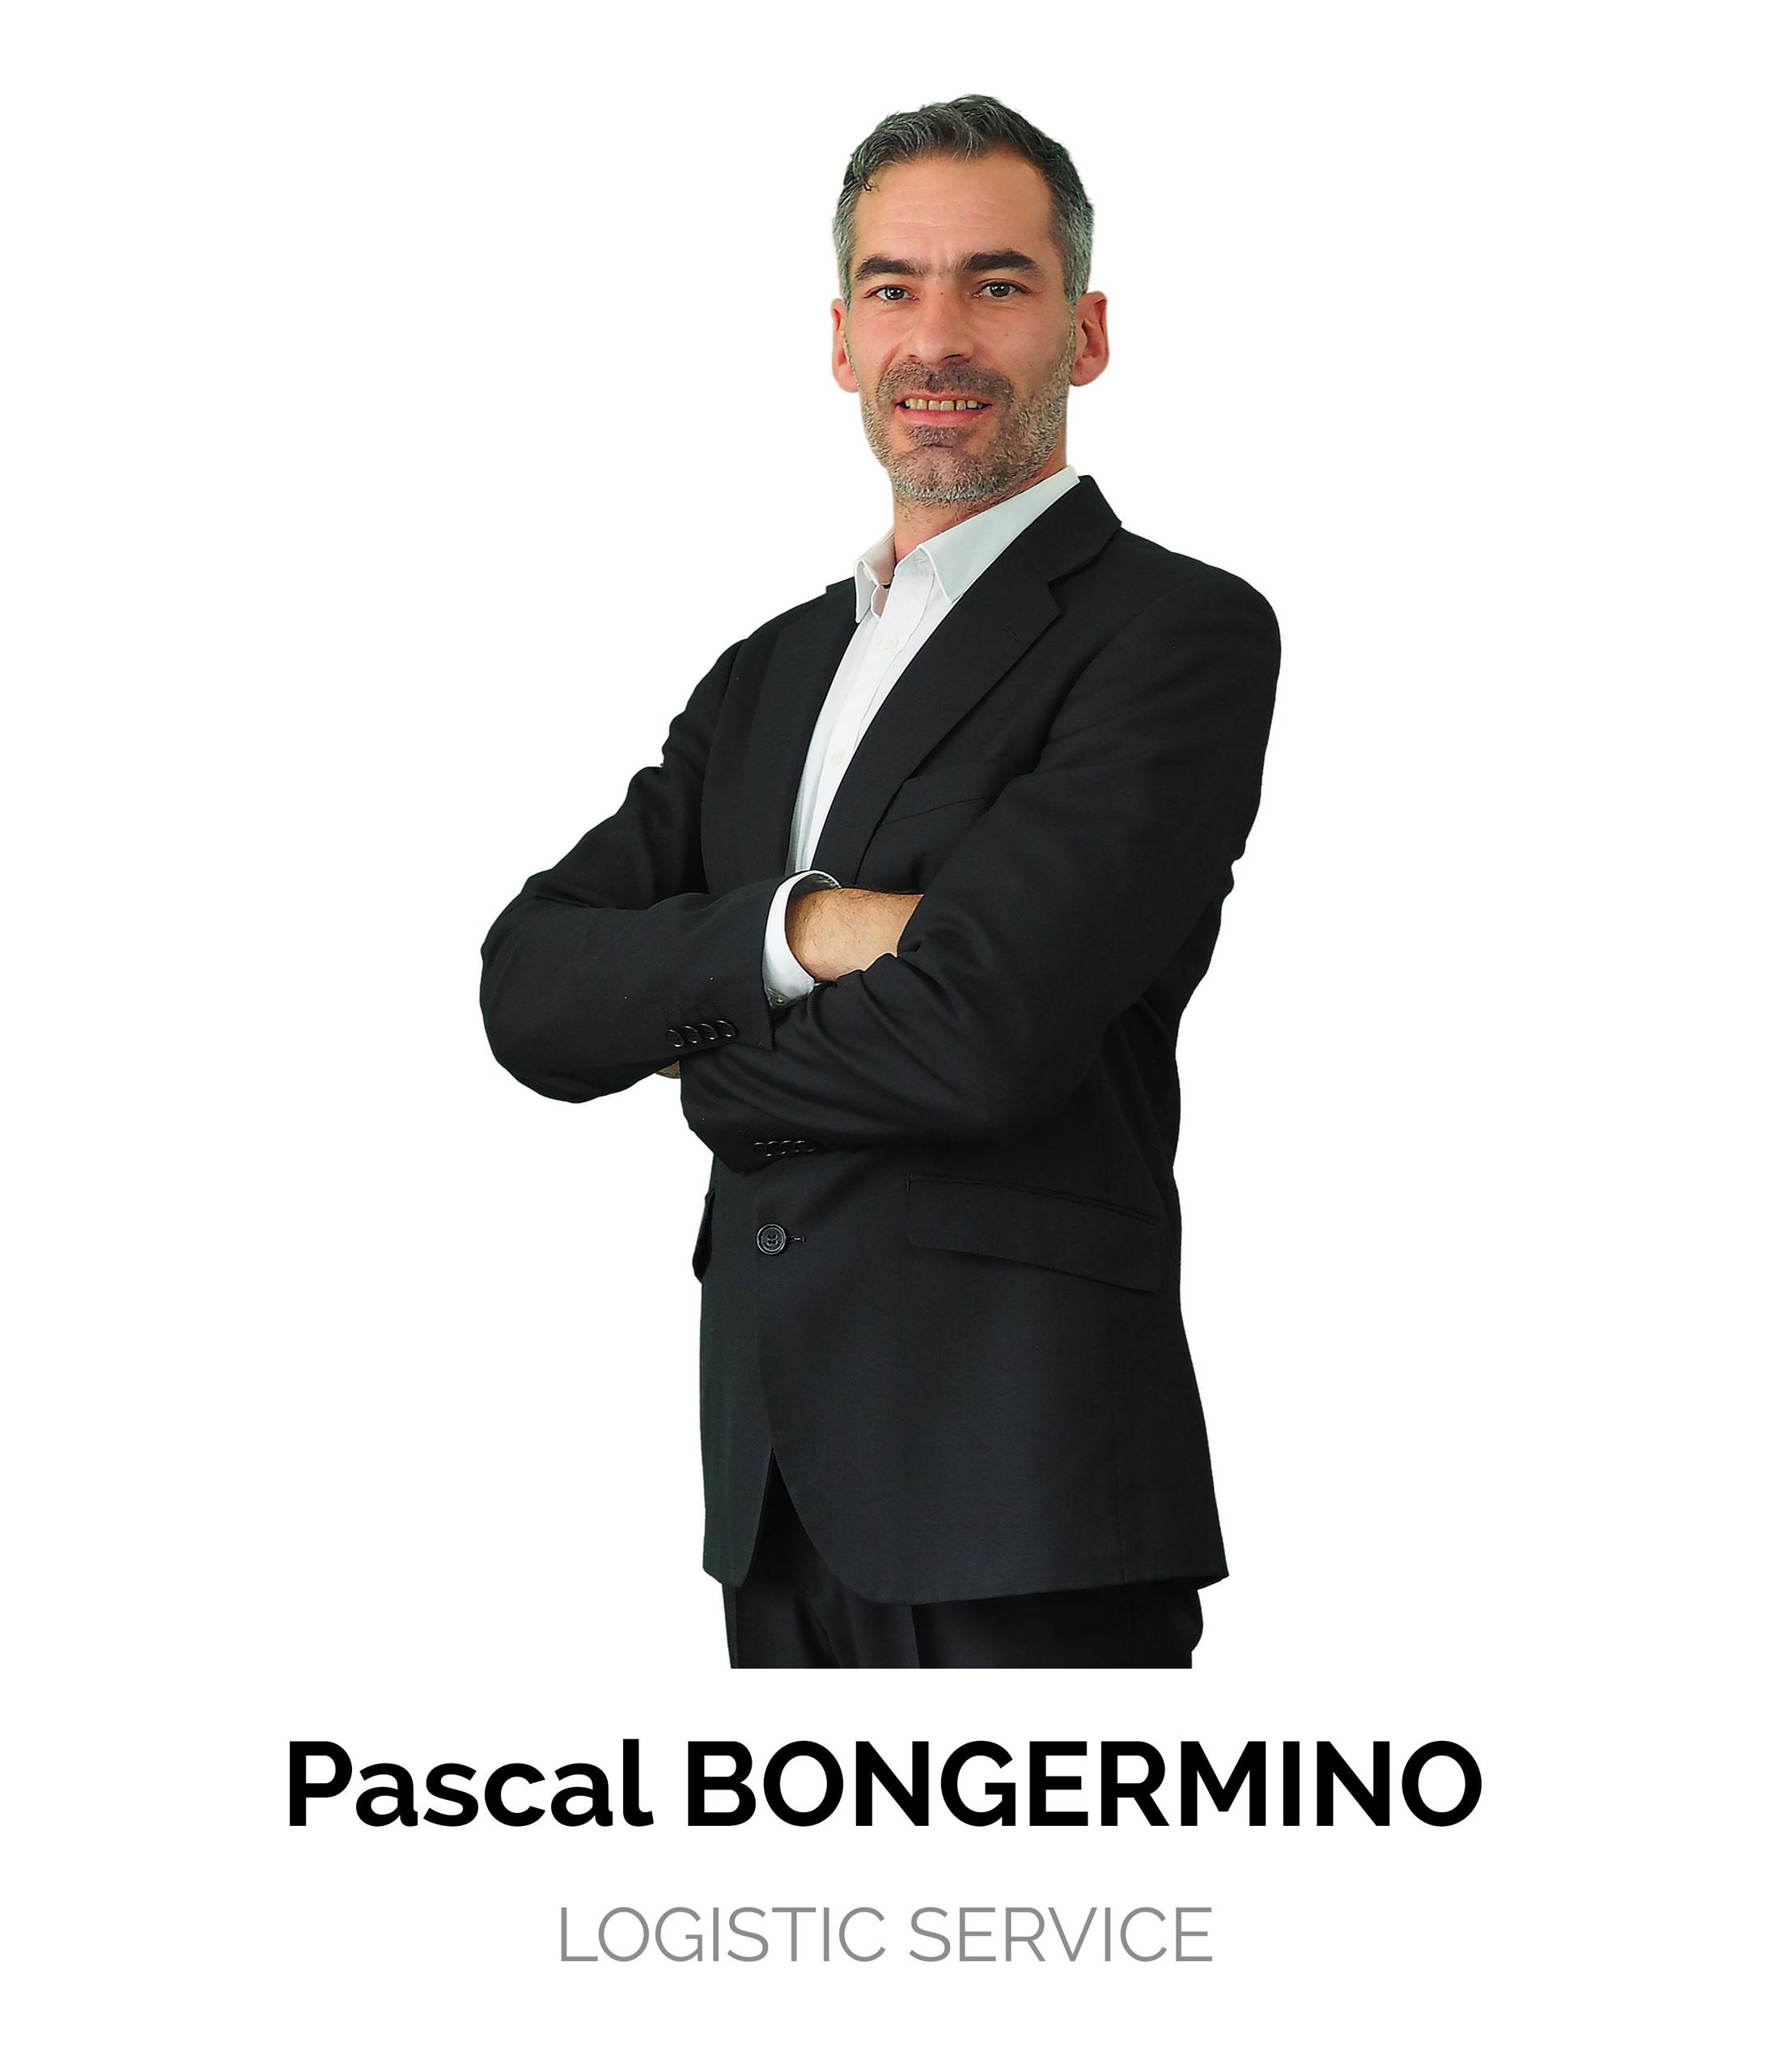 pascal-bongermino